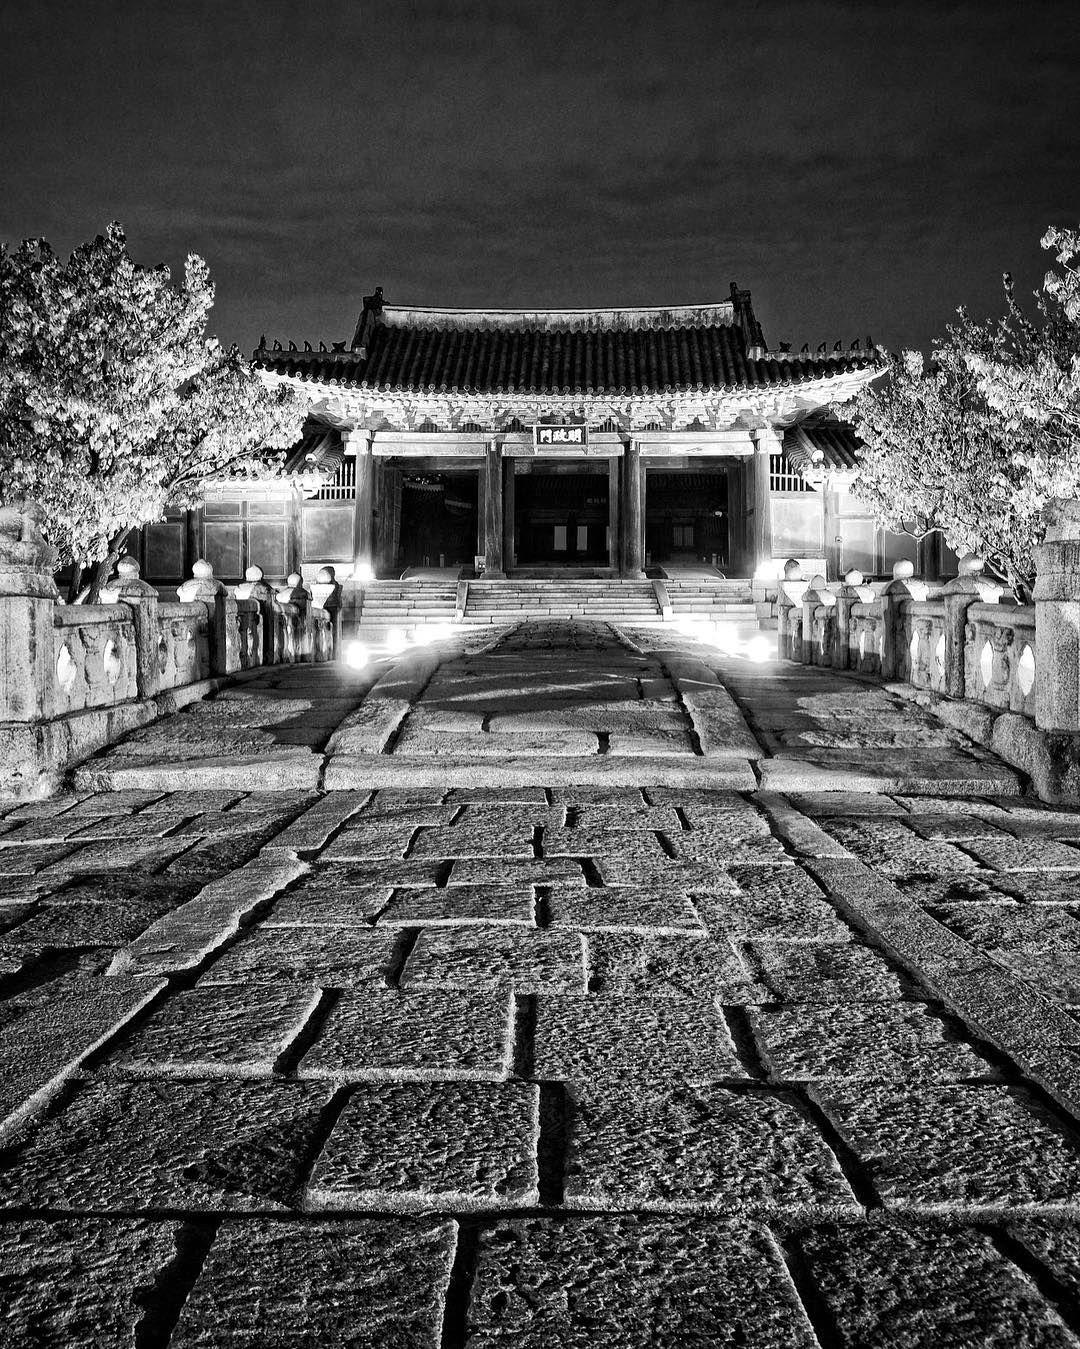 Light vs Darkness at Changdeok Palace's gate. #blackandwhite #monochrome #palace #korea #travel #night #nighttours #dark #light #life #history #seoul #bigcityseoul #iseoulu #history #historical #peaceful #urban #changdeokgung #창덕궁 #서울 #서울시 #여행